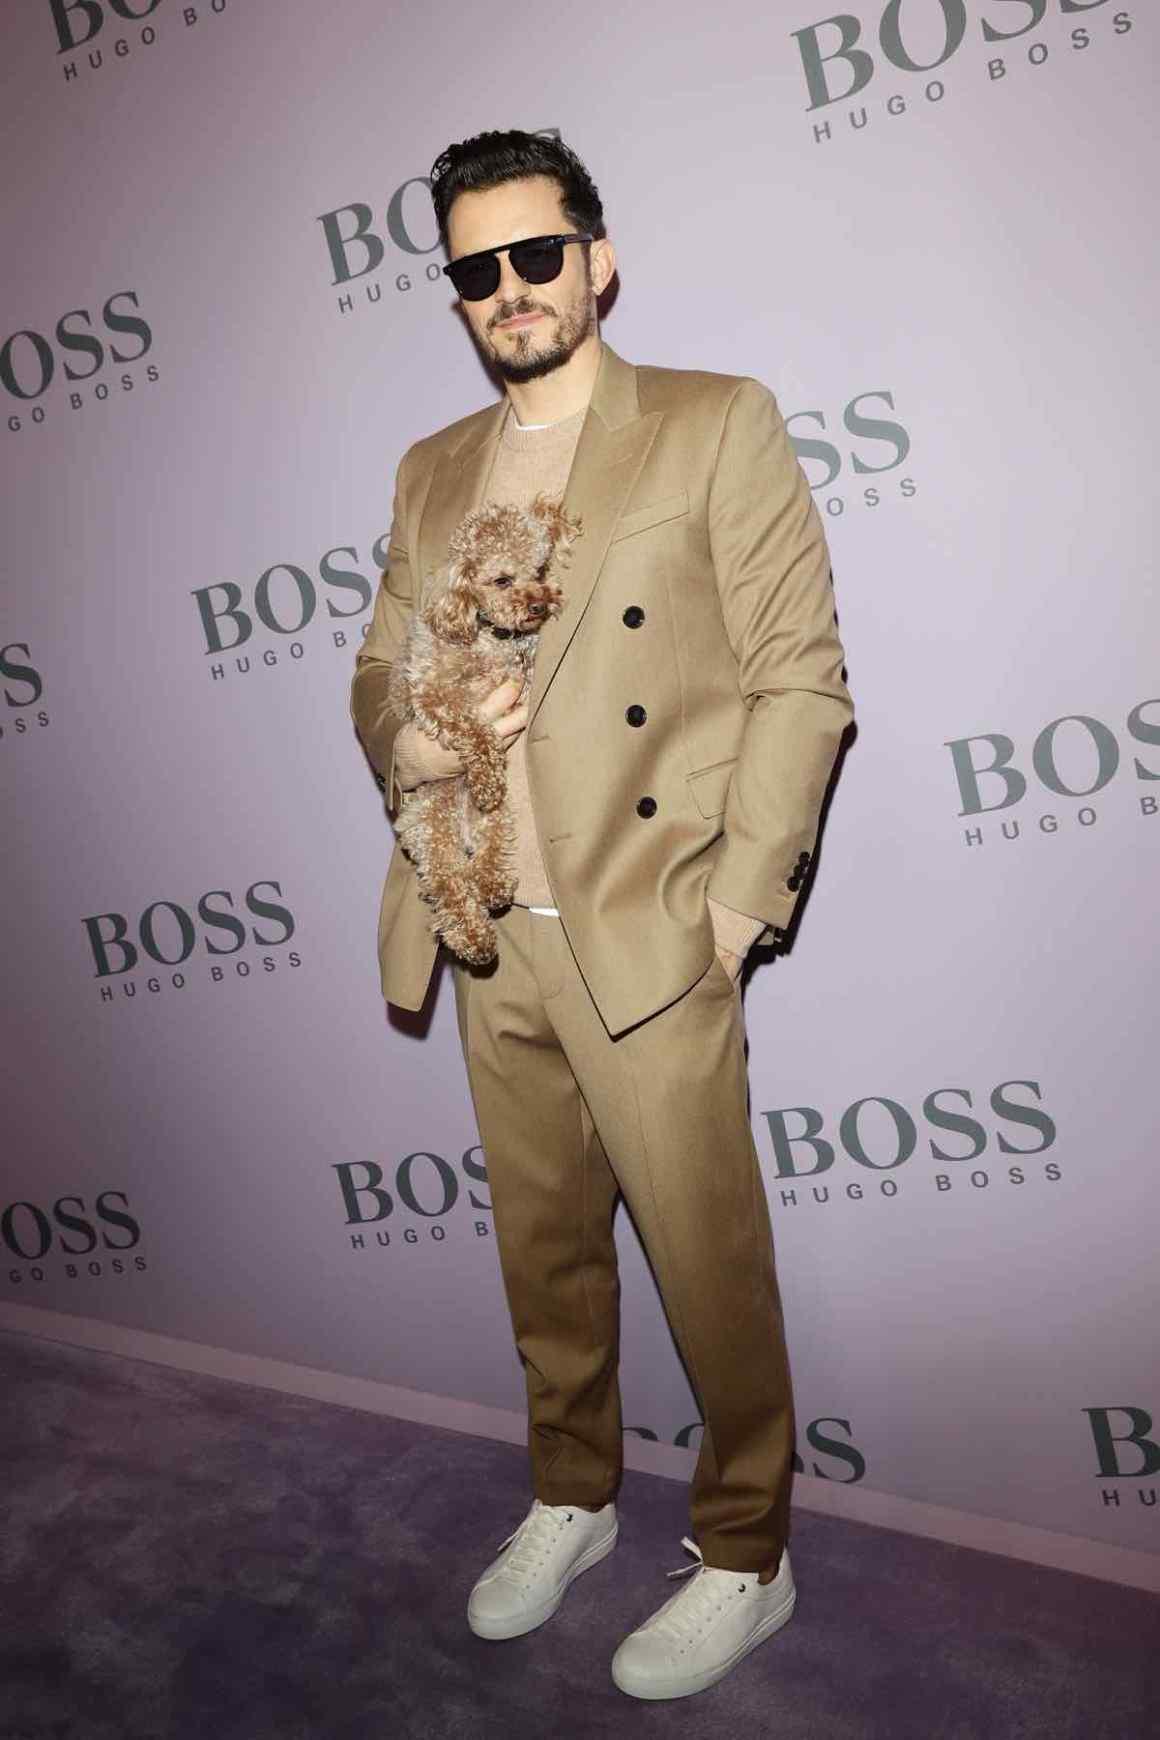 BOSS - Photocall - Milan Fashion Week Fall/Winter 2020